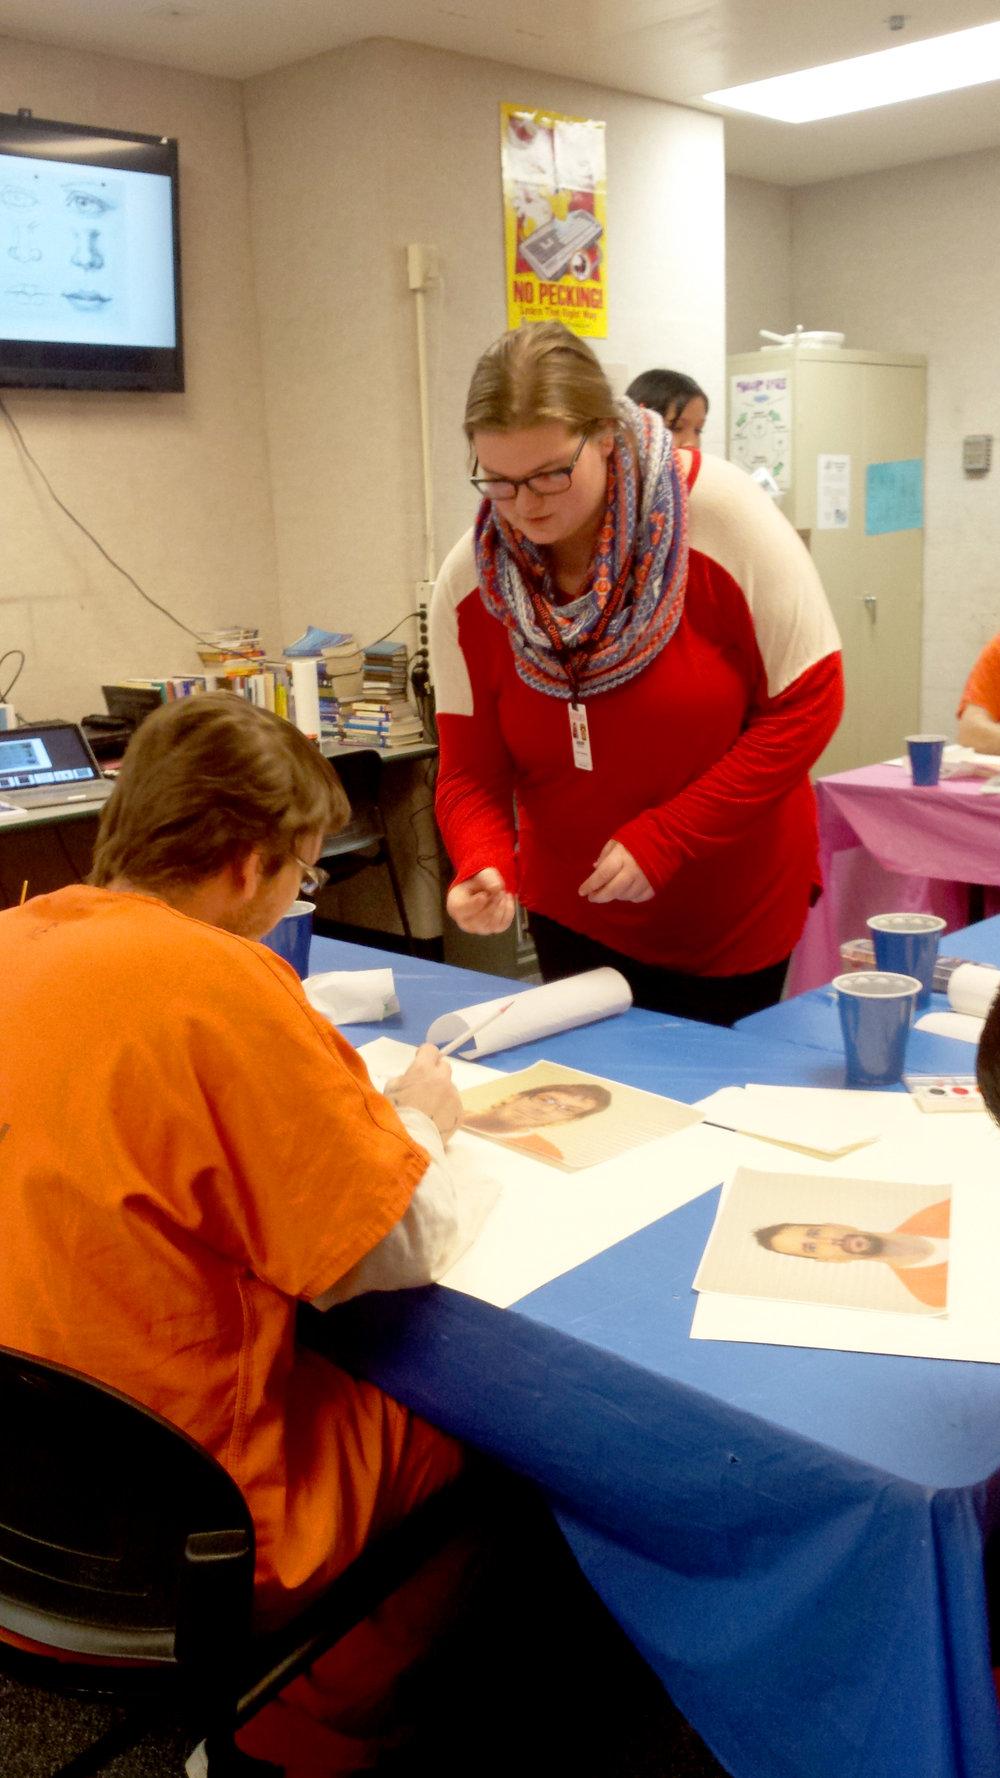 Sierra Thomfohrda  UW-Stout Art Education INTERNSHIPS: 1) Painting classes, Dunn County Jail 2) Arts and Crafts, Boys and Girls Club